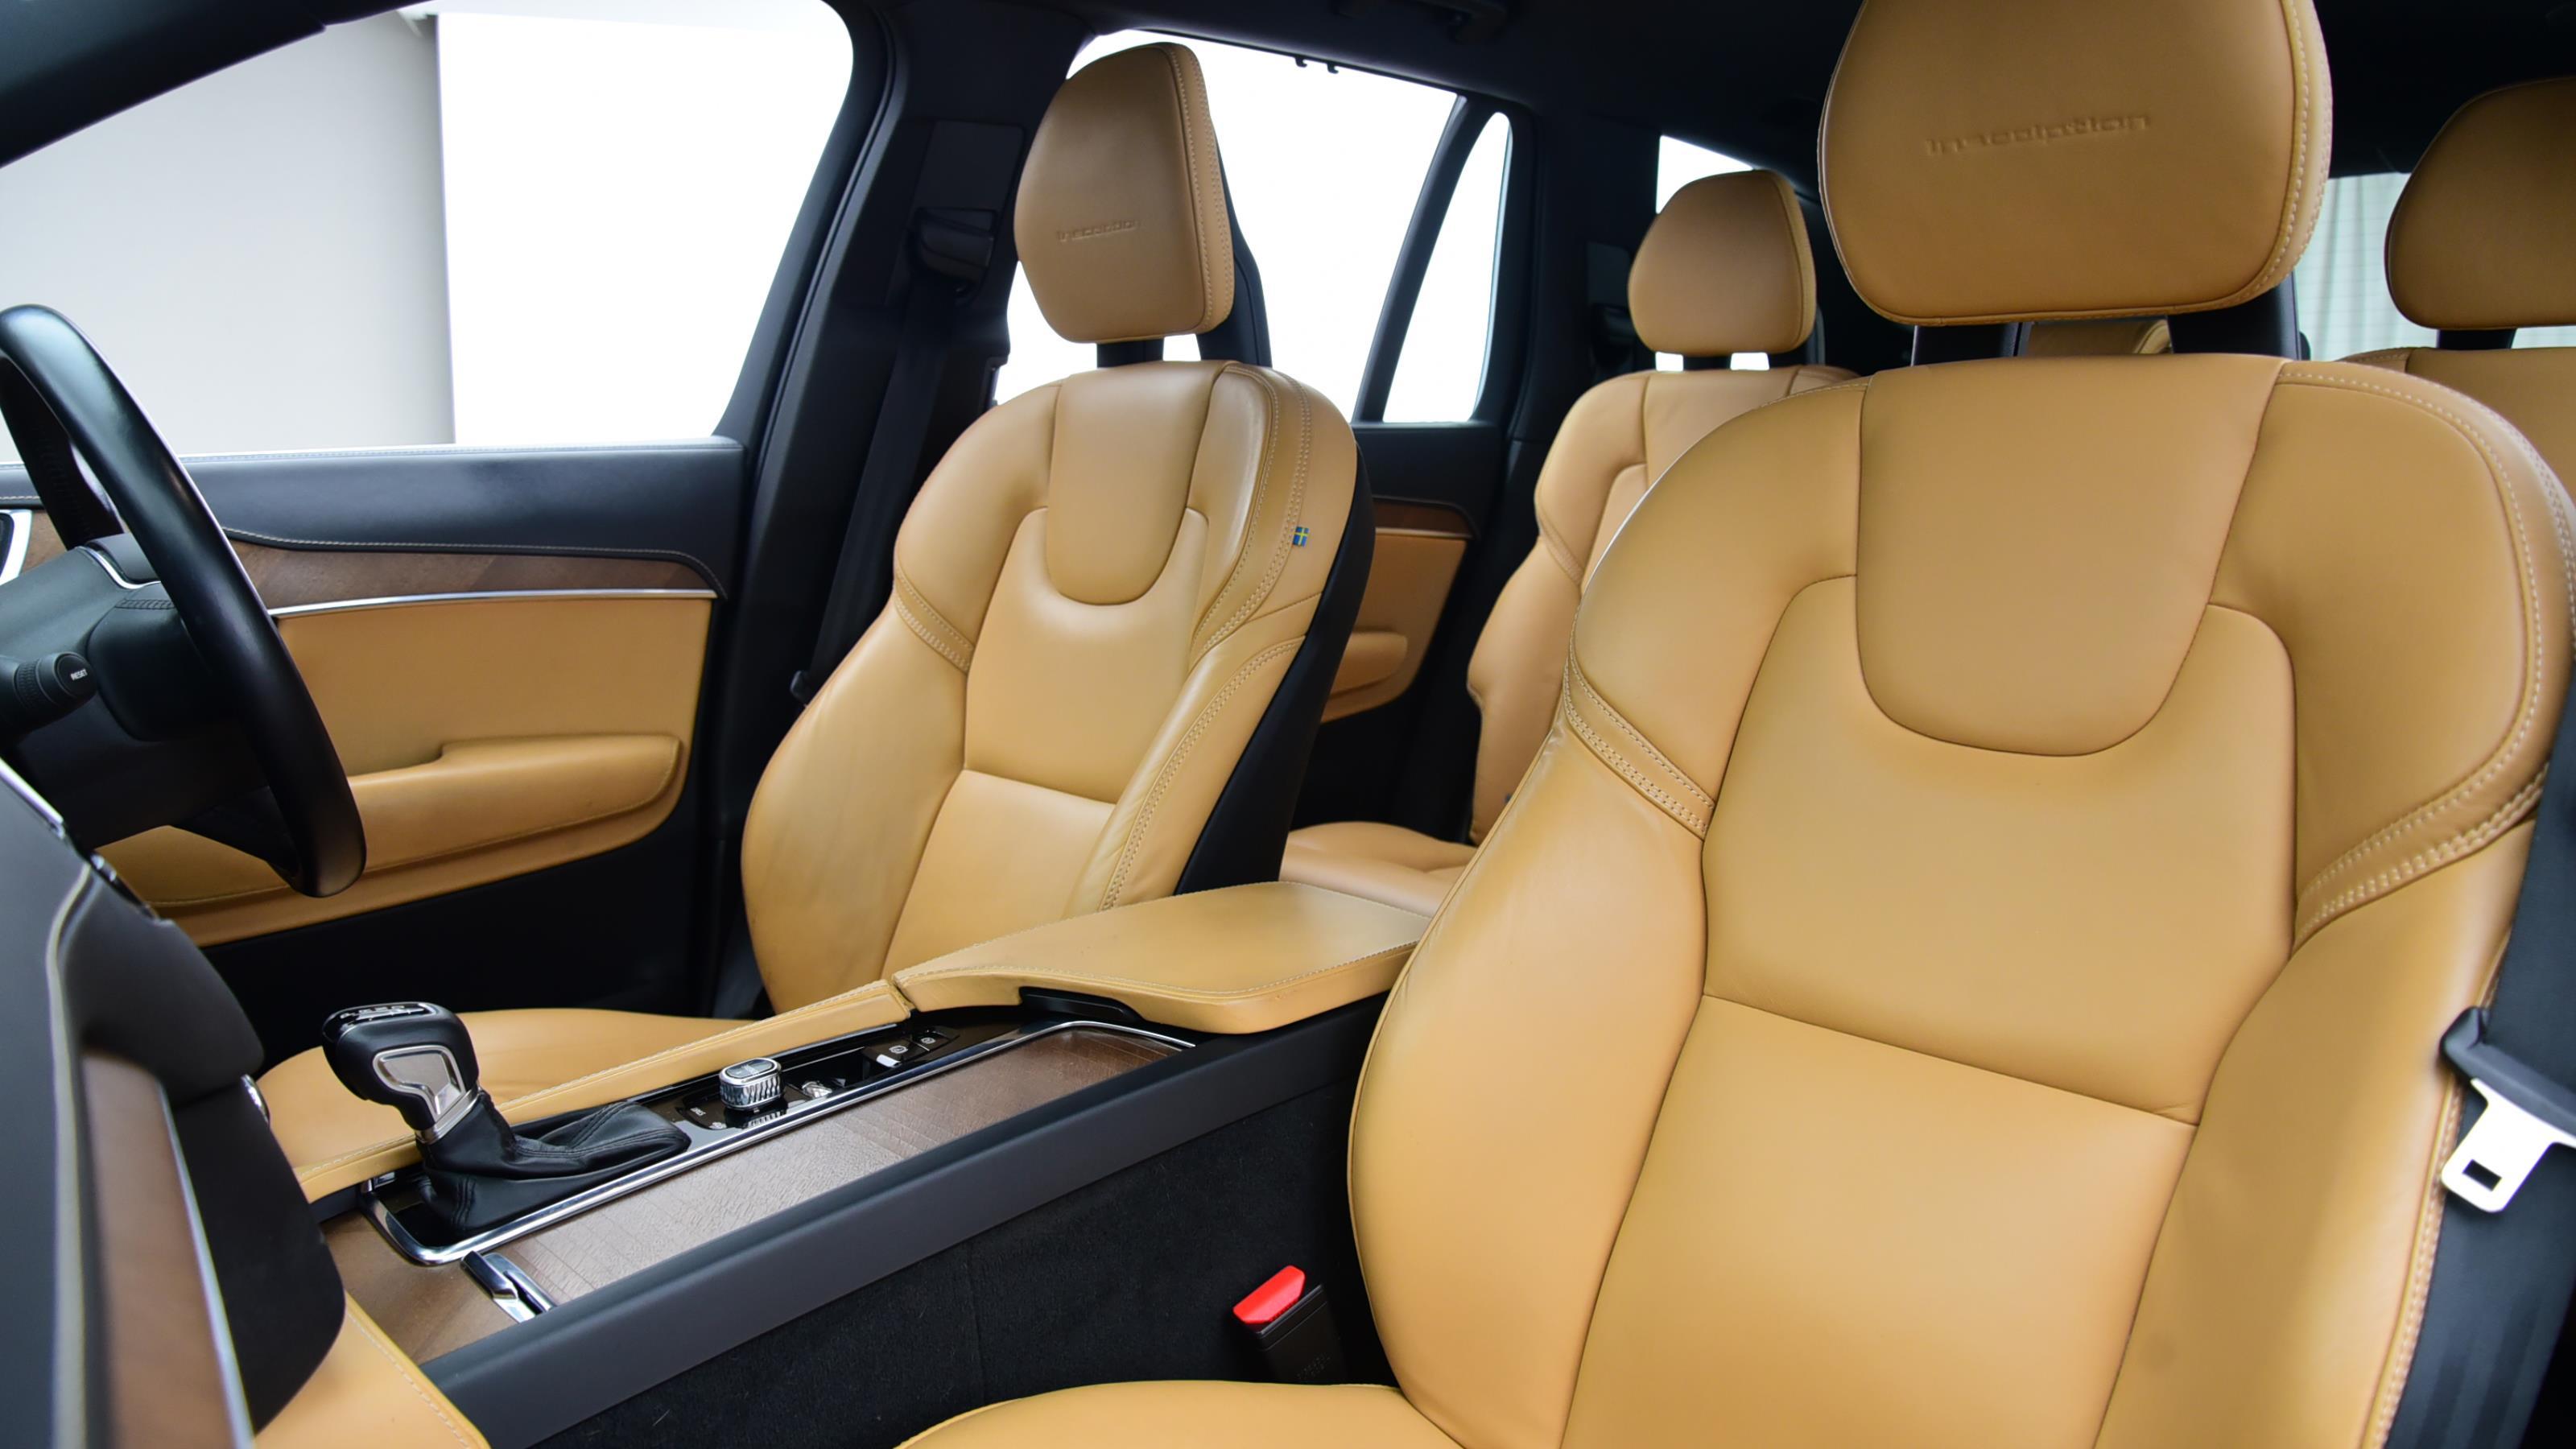 Used 2016 Volvo XC90 2.0 D5 PowerPulse Inscription 5dr AWD Geartronic BLACK at Saxton4x4